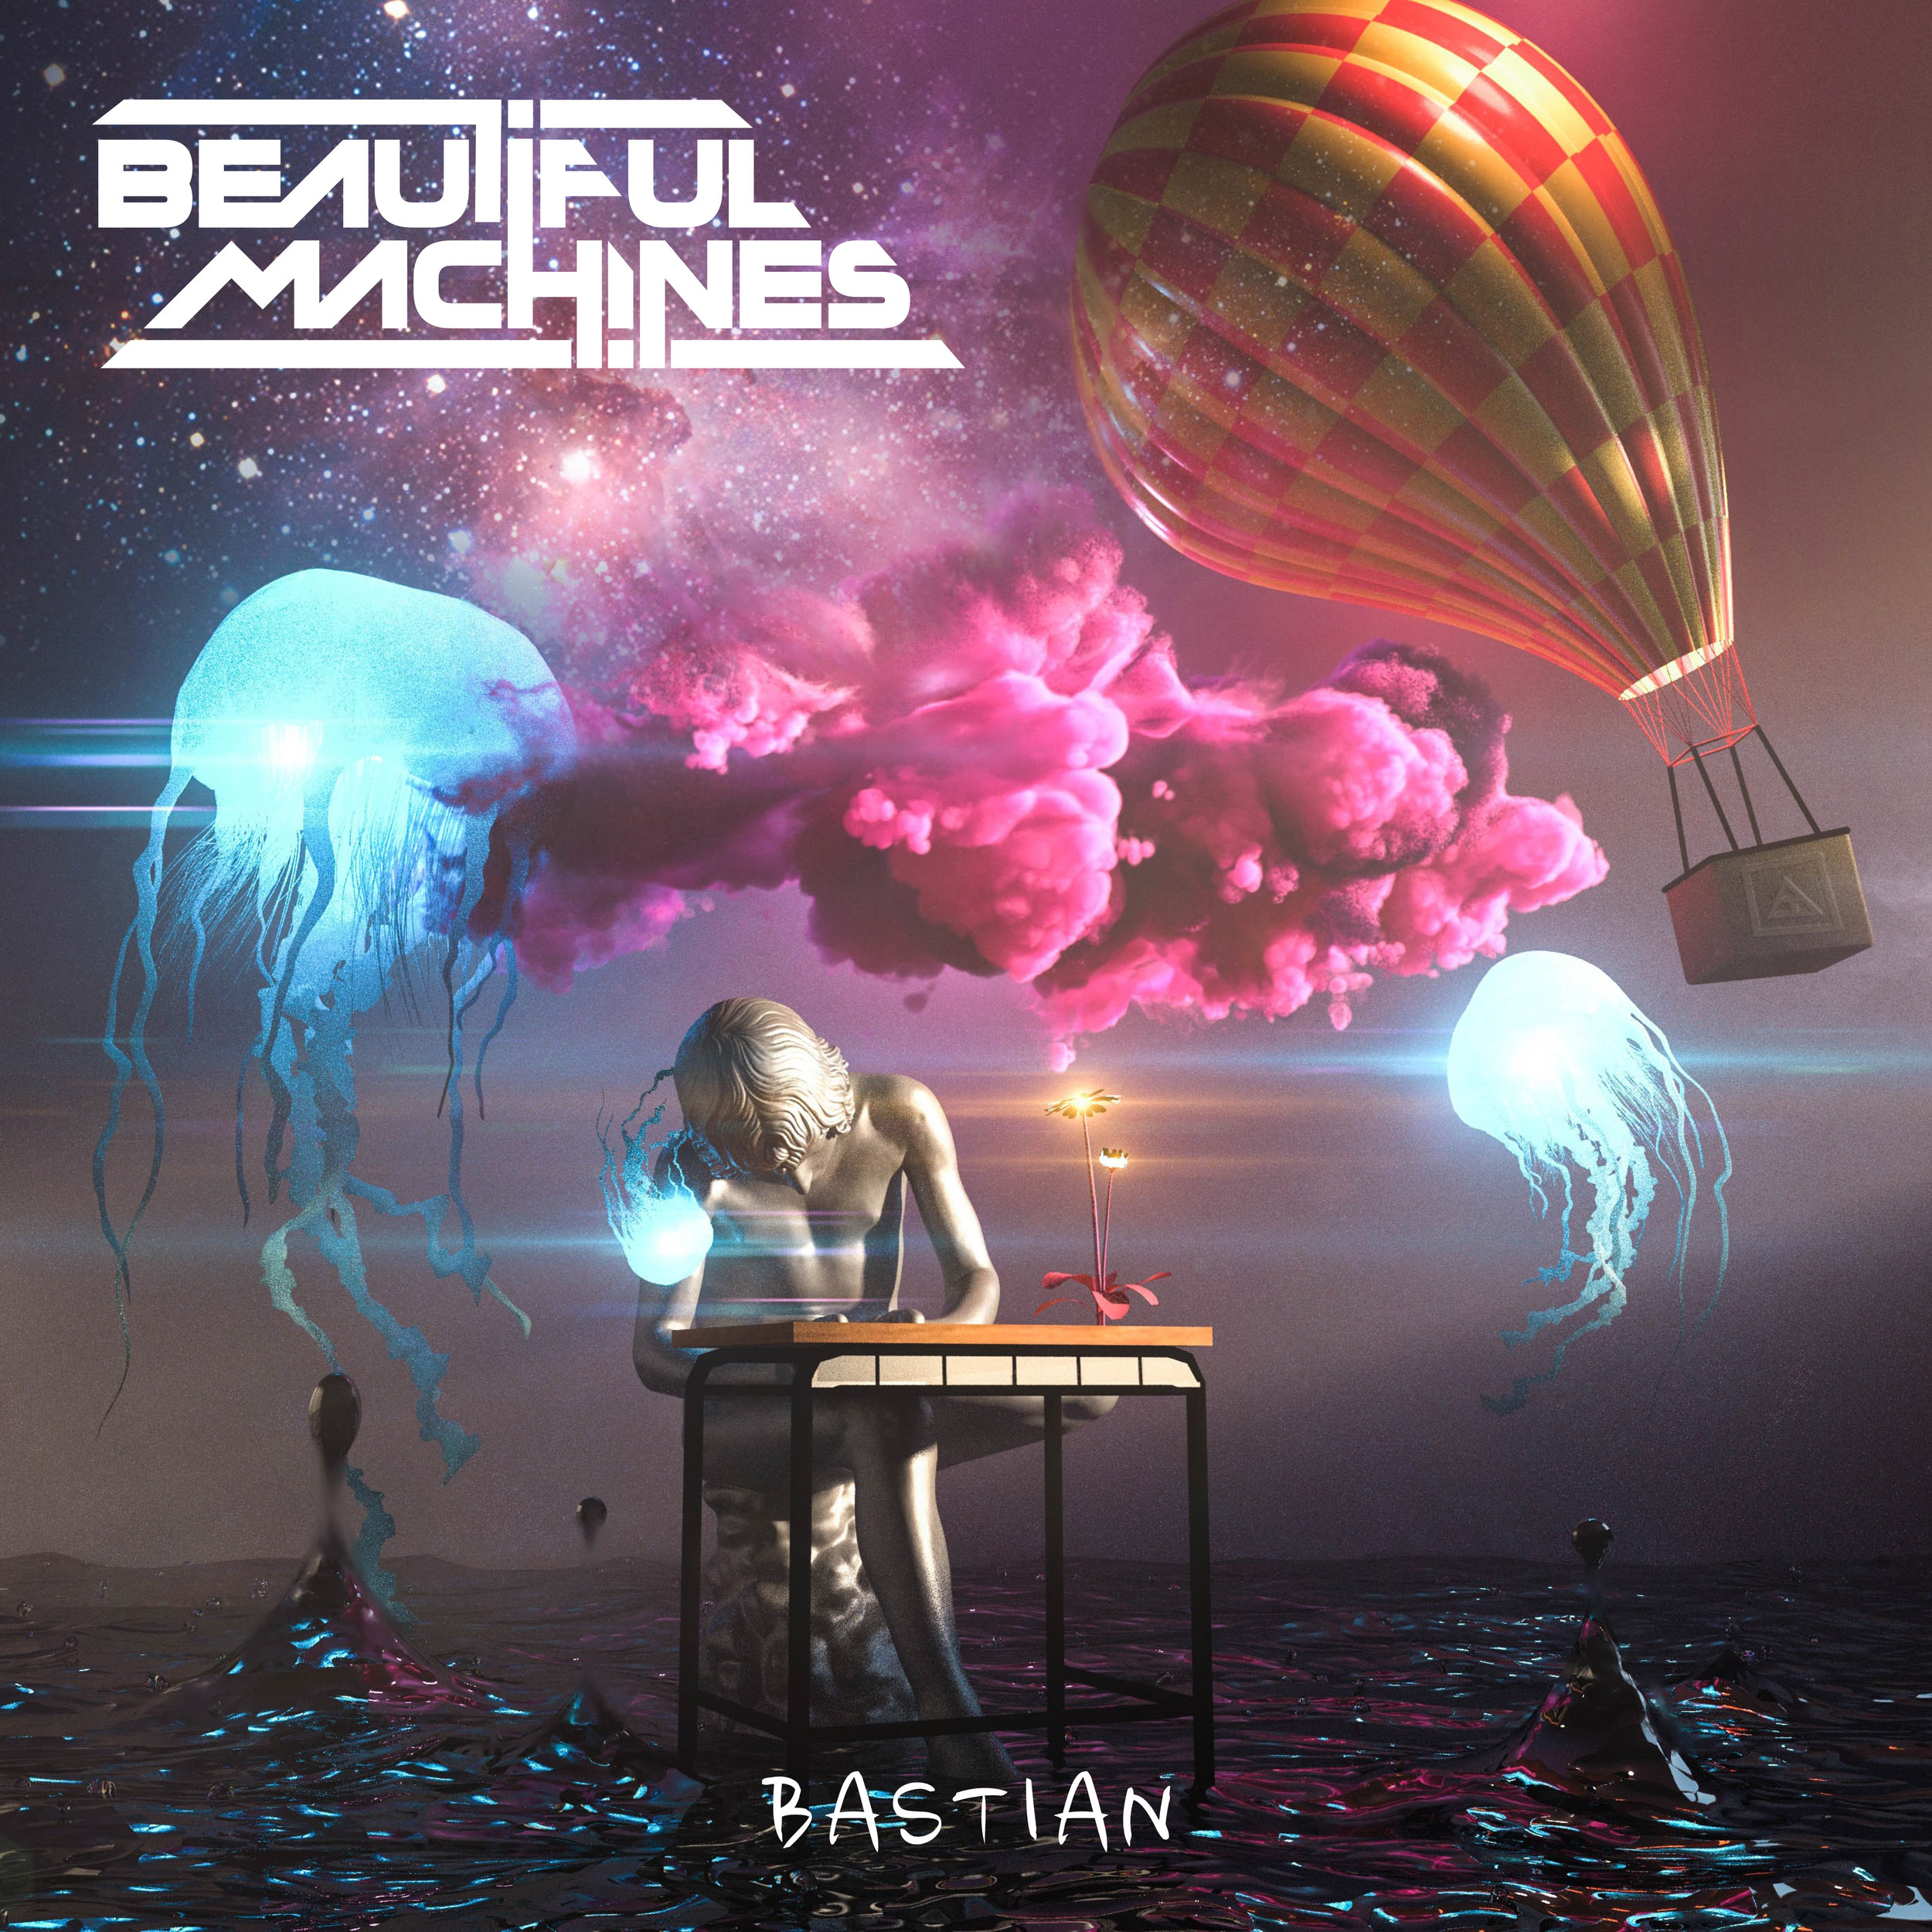 Artwork - Beautiful Machines - Bastian 4700x4700.jpg